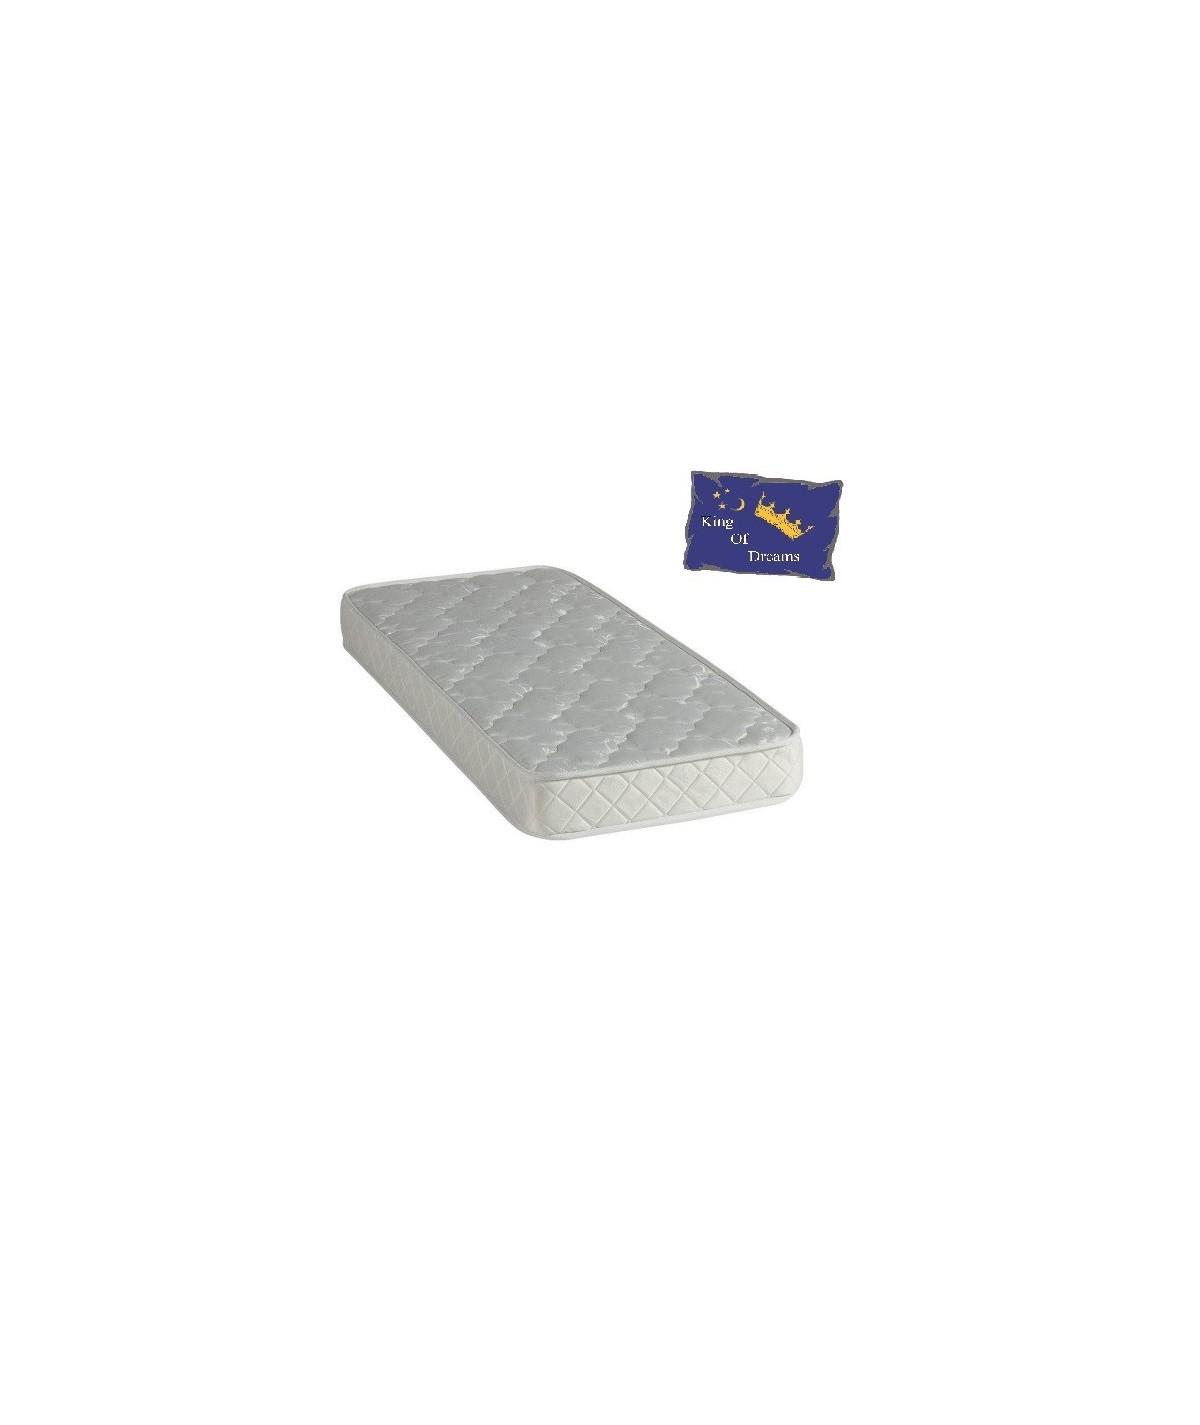 Baby Dream Mattress Polilattex Foam - Height 15 Cm - Anti-mite Antibacterial Hypoallergenic